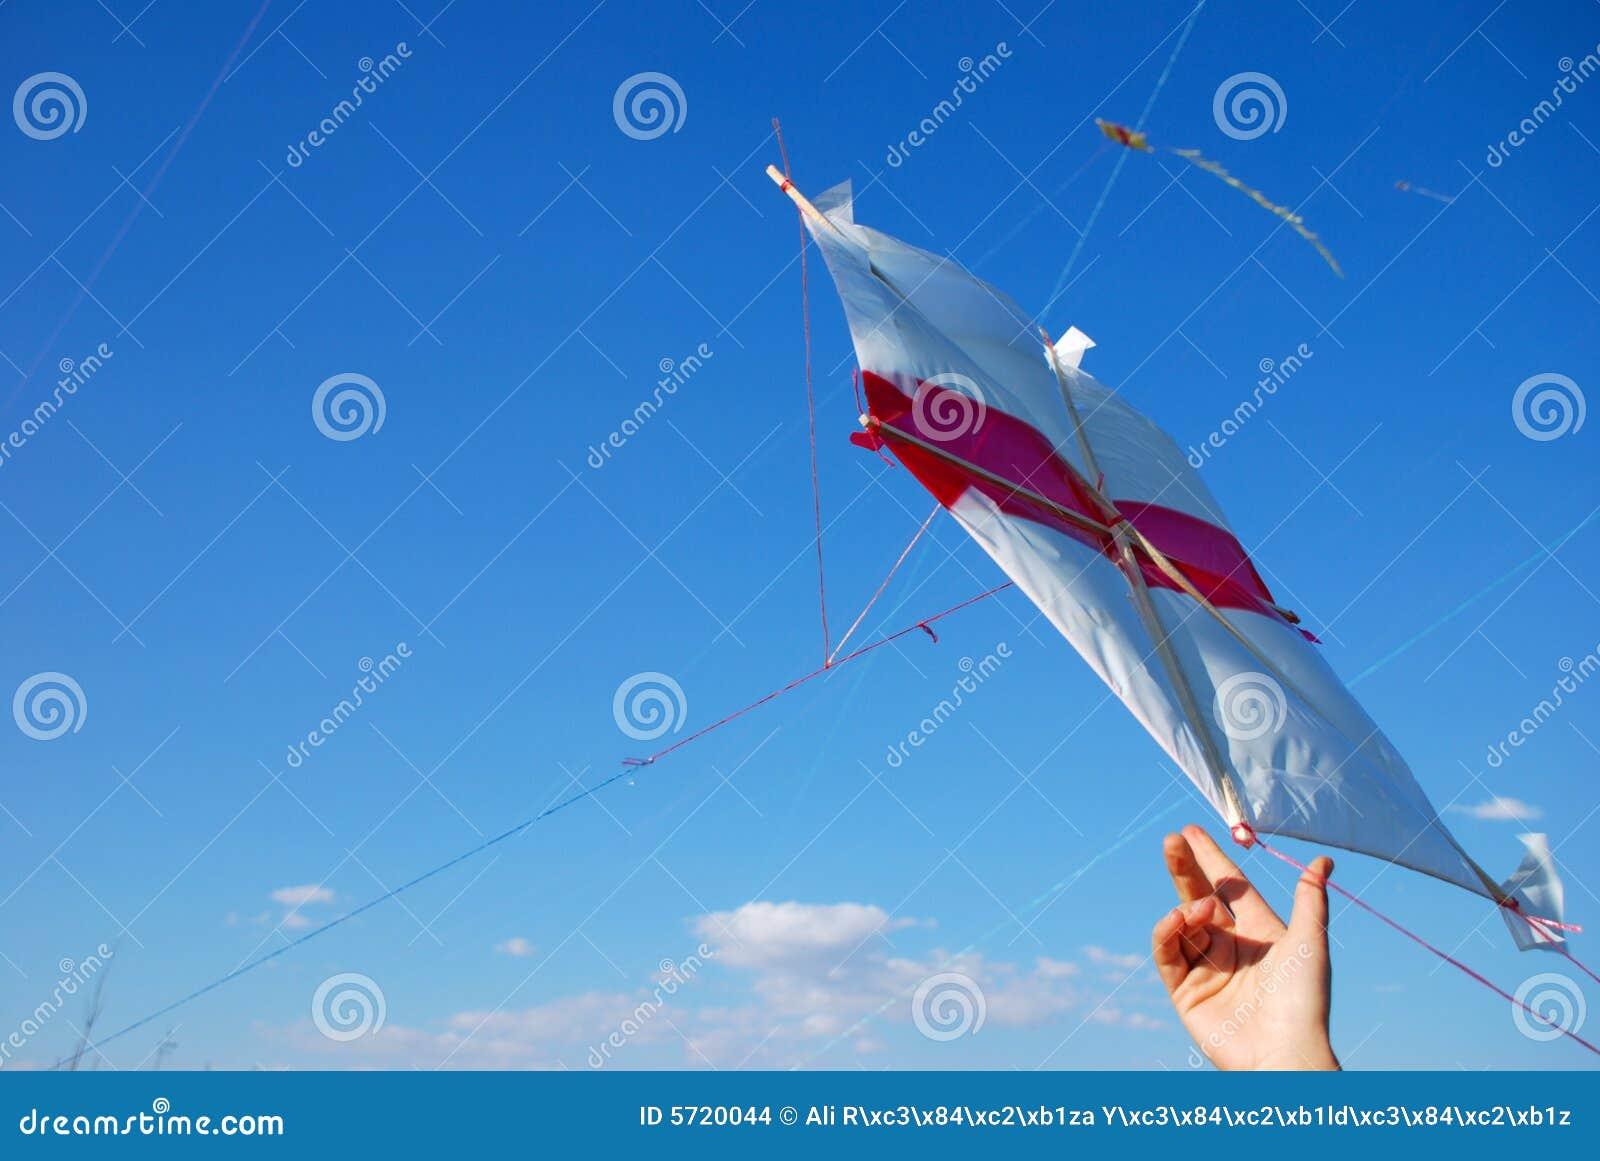 Cerf-volant de vol